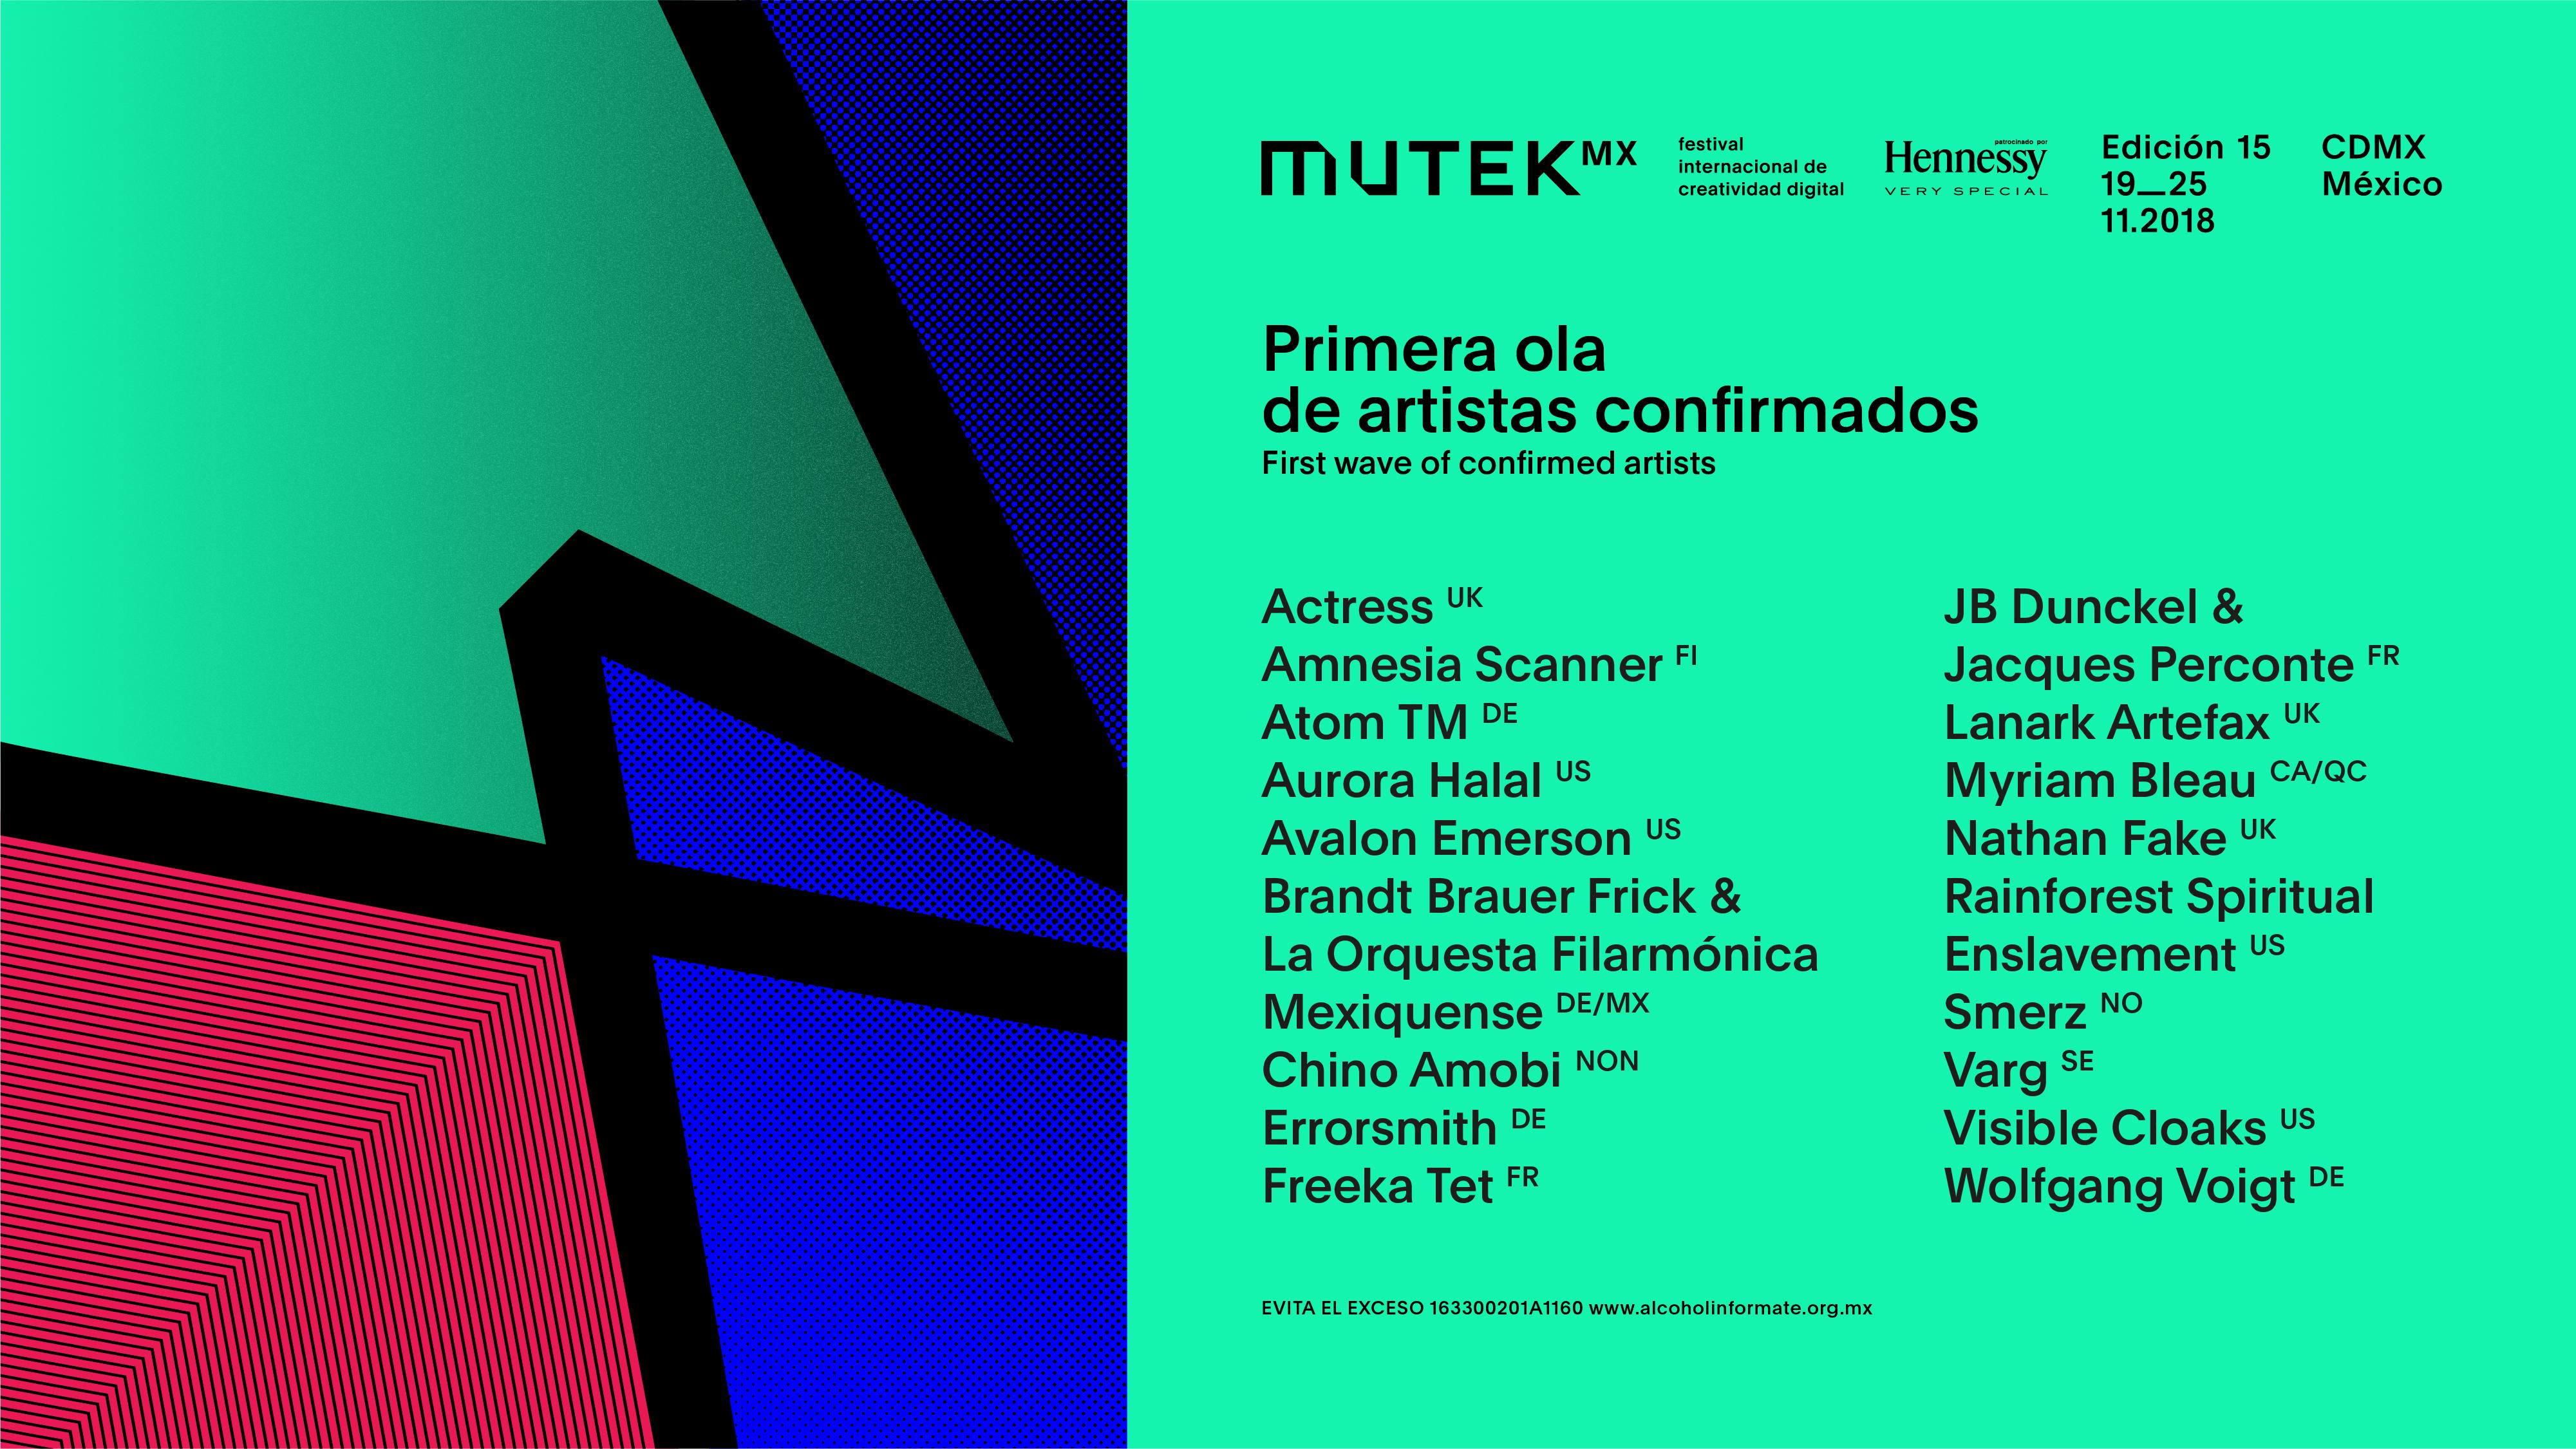 MUTEK.MX 2018